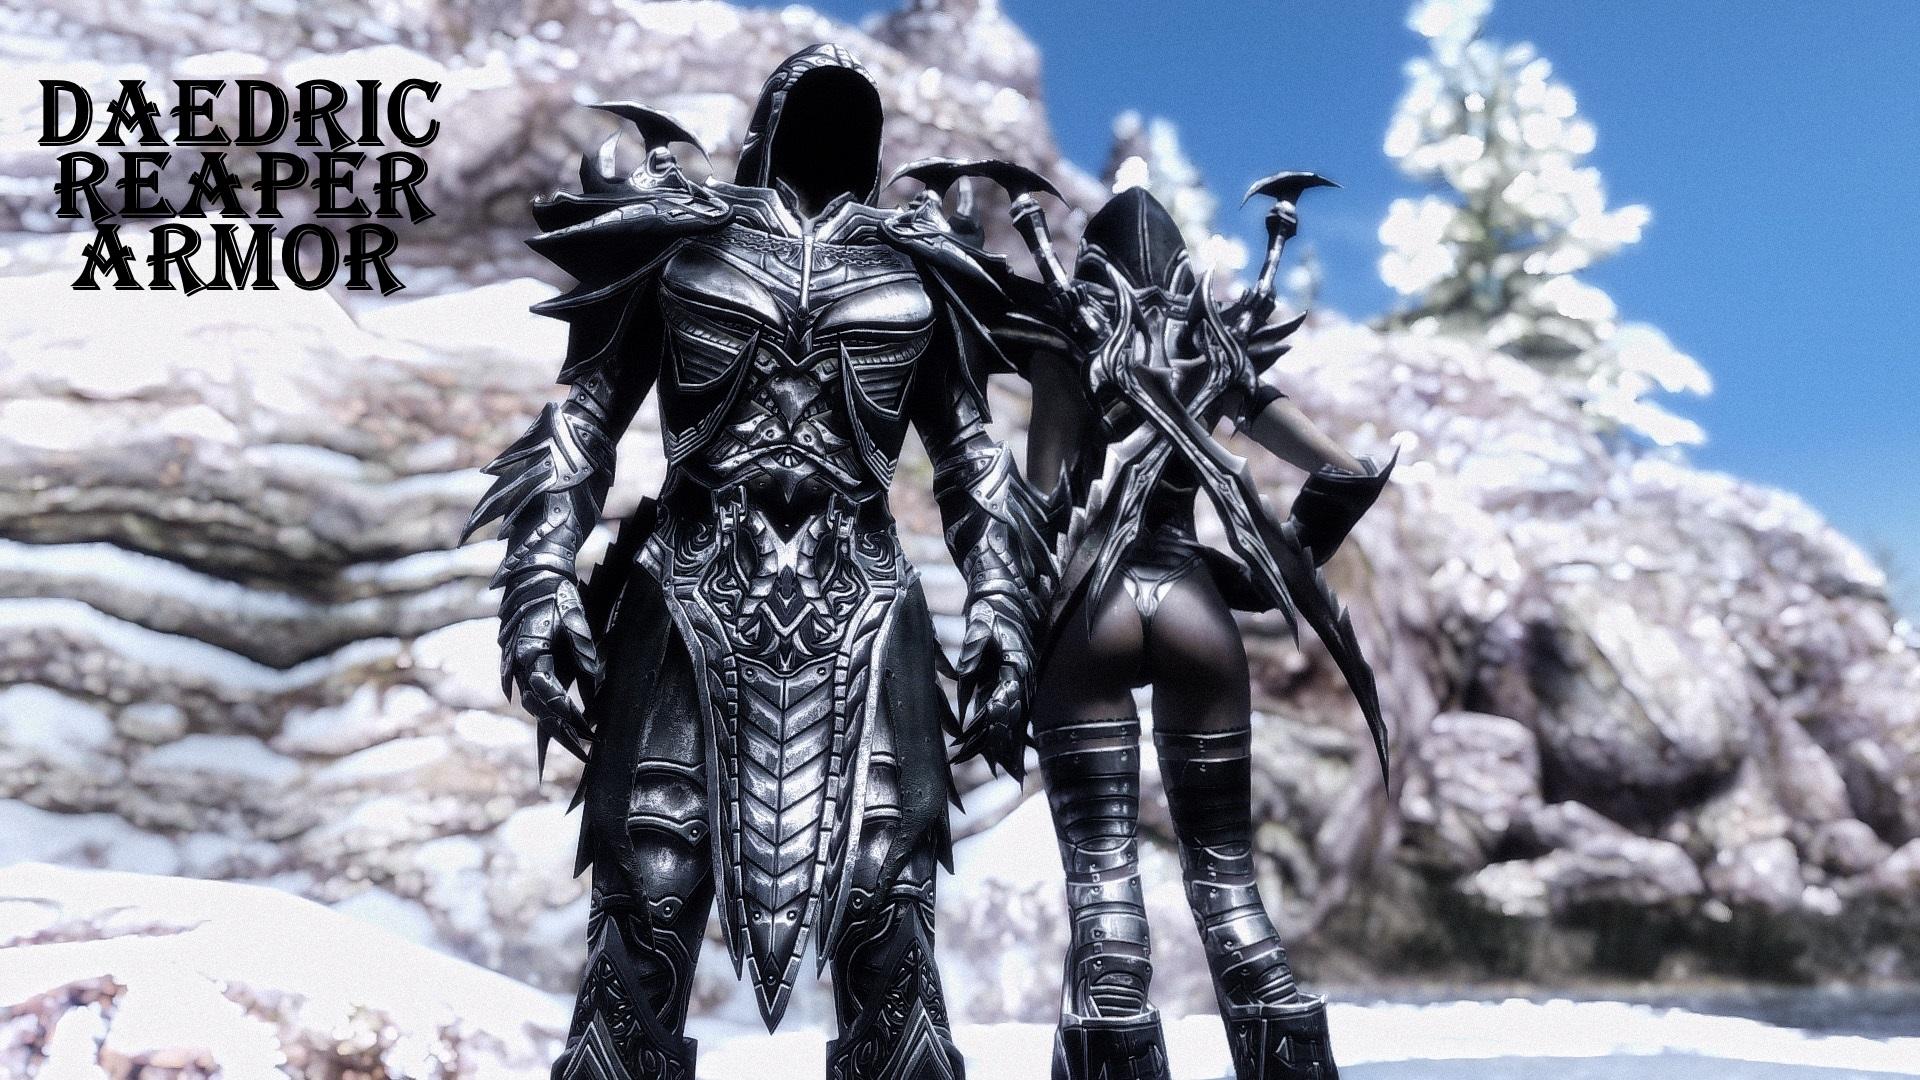 Daedric_Reaper_Armor_00.jpg